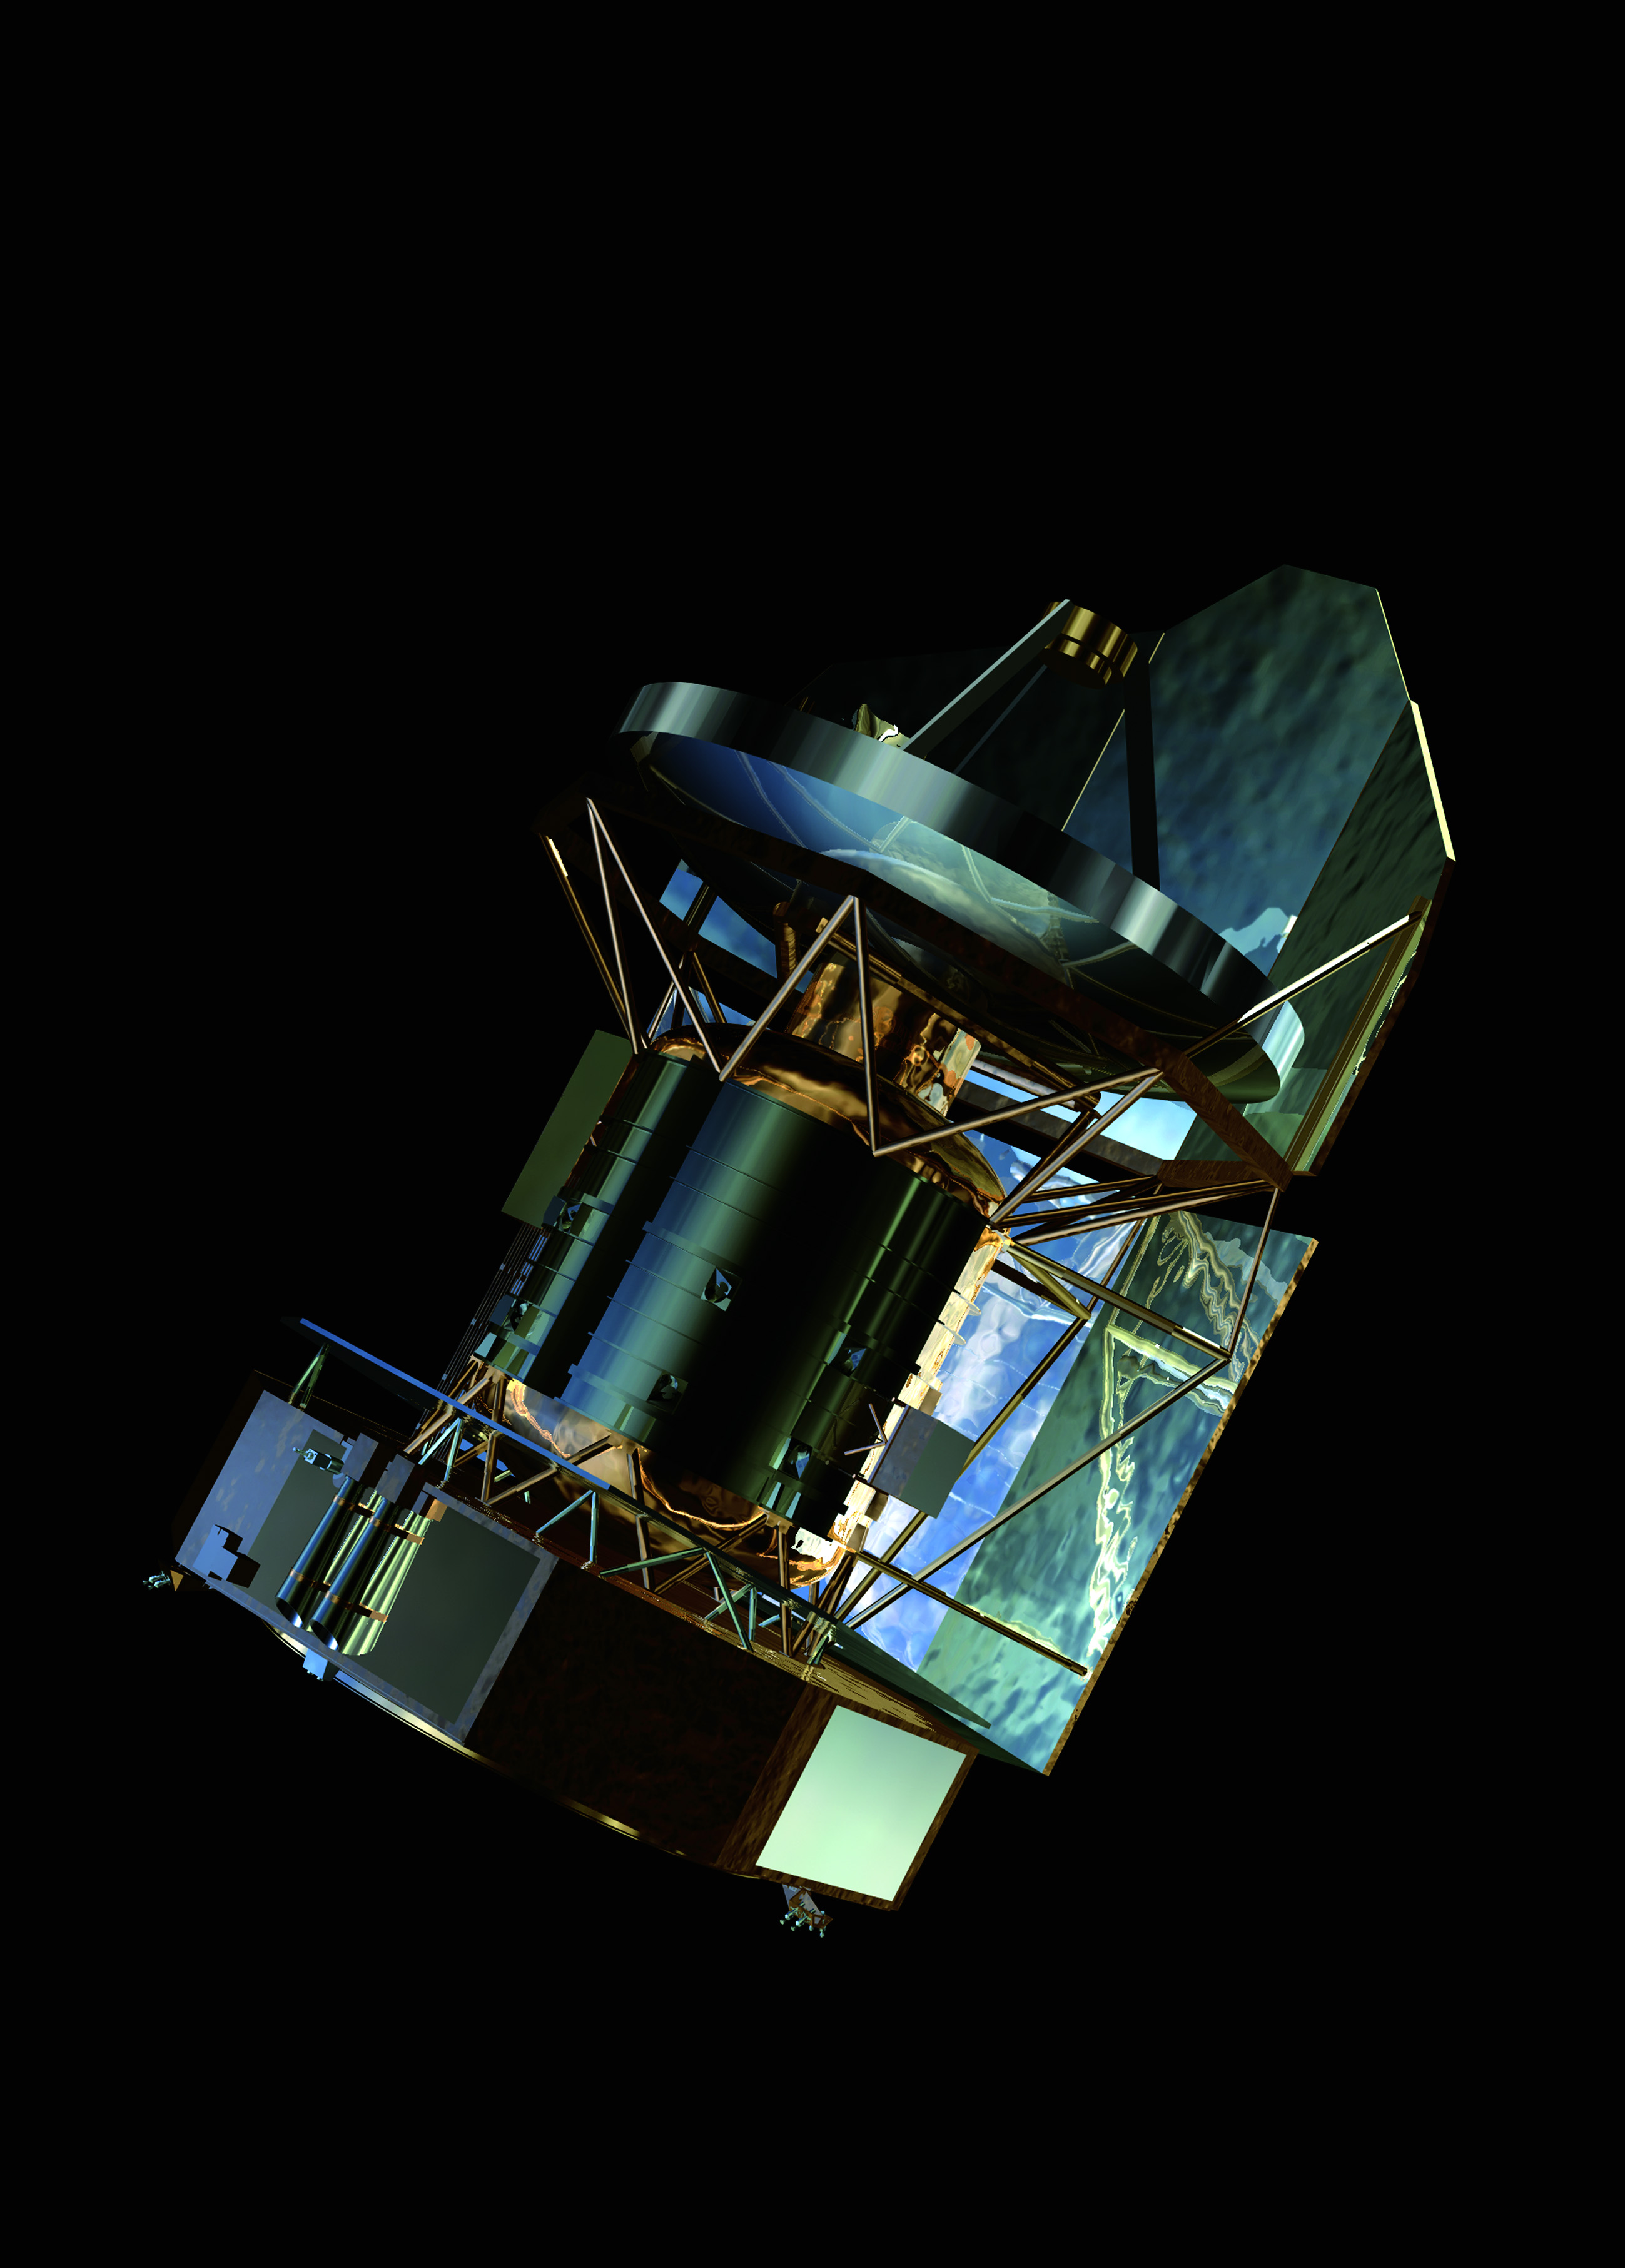 herschel s telescope will collect infrared radiation from distant    Herschel Telescope